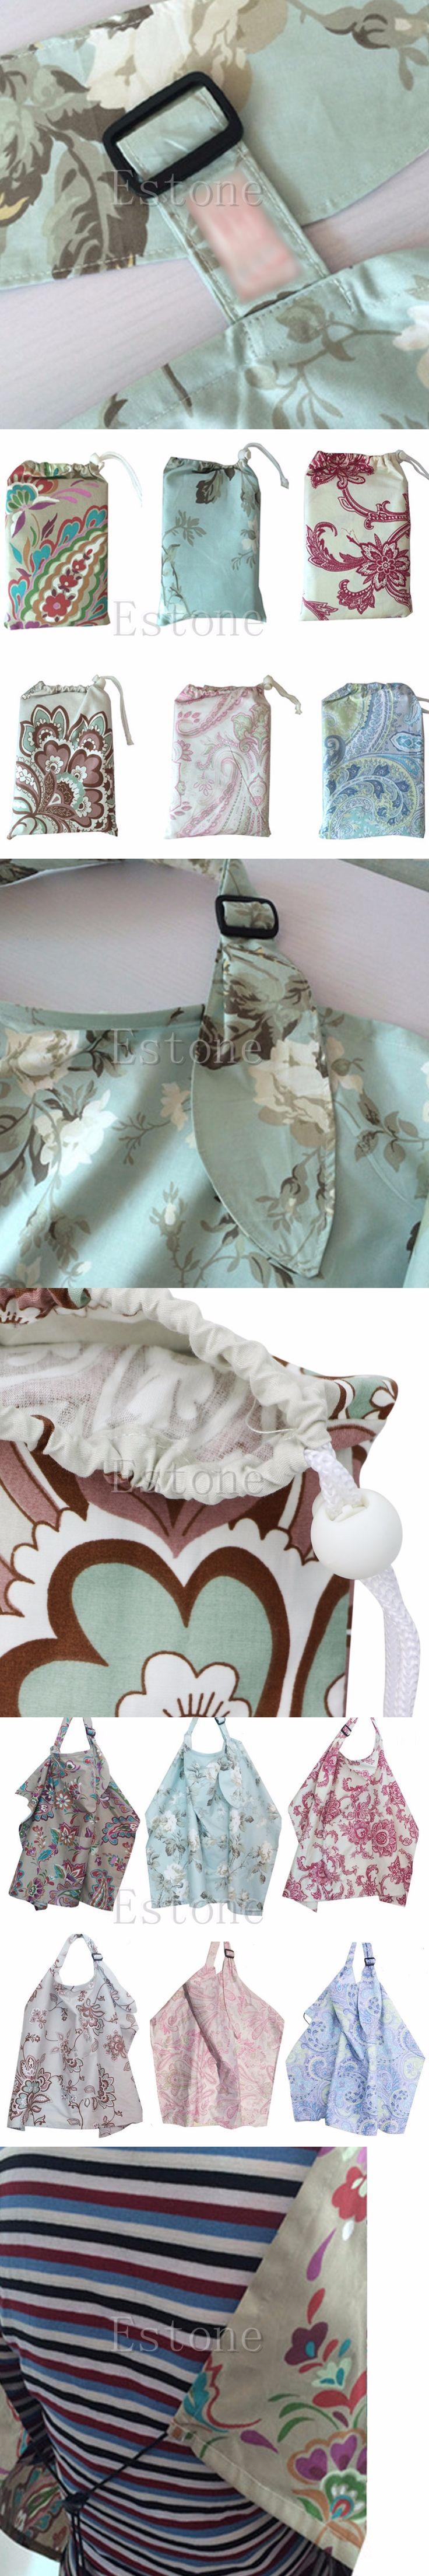 Chic Mum Women Udder Cover Baby Breastfeeding Nursing Cotton Blanket Shawl